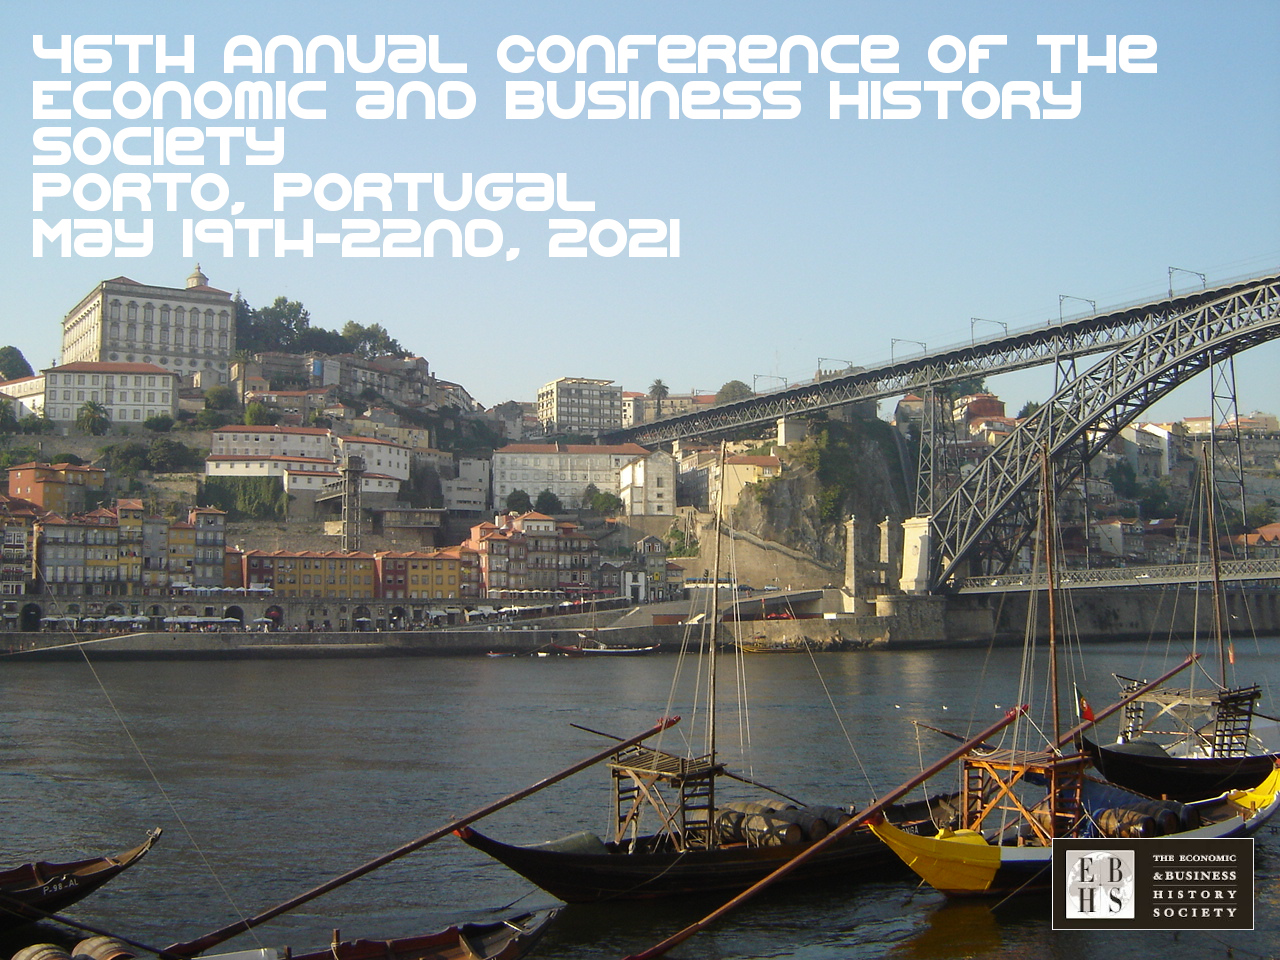 EBHS Porto 2021 (photo by Rodrigo Dominguez)